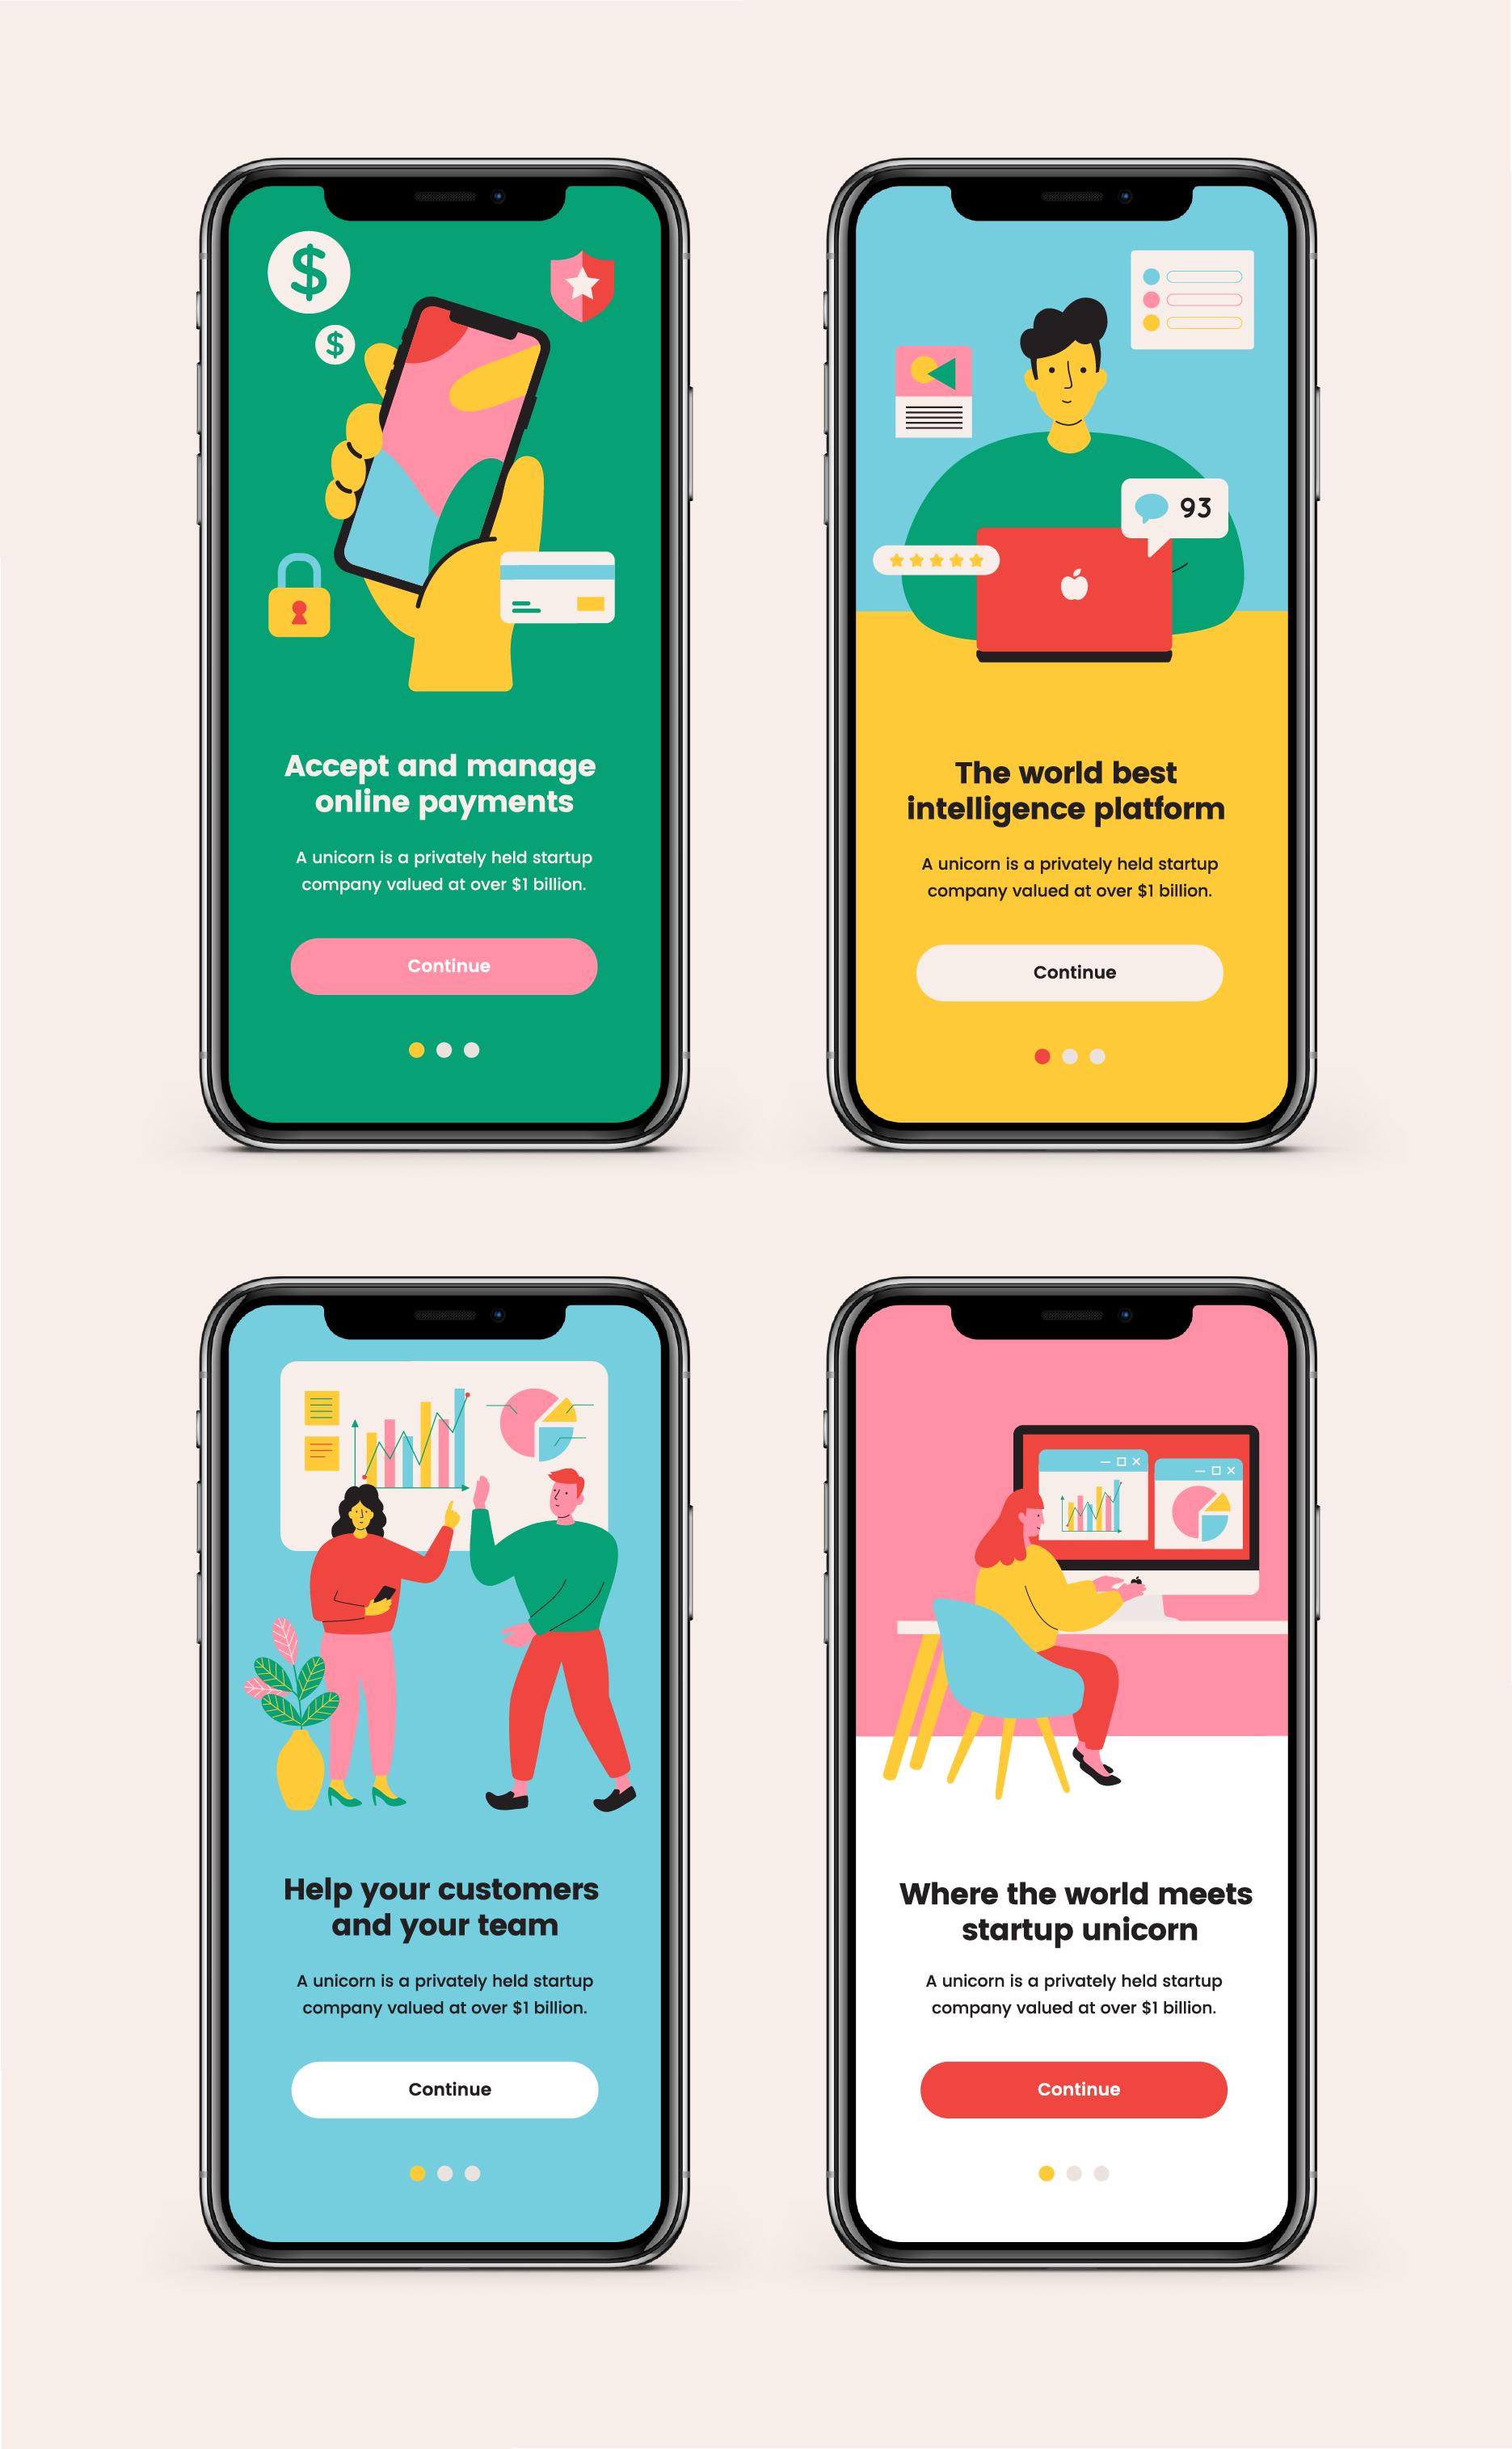 Unicorn Startup Illustration Pack In 2020 Mobile App Design Web Design Mobile App